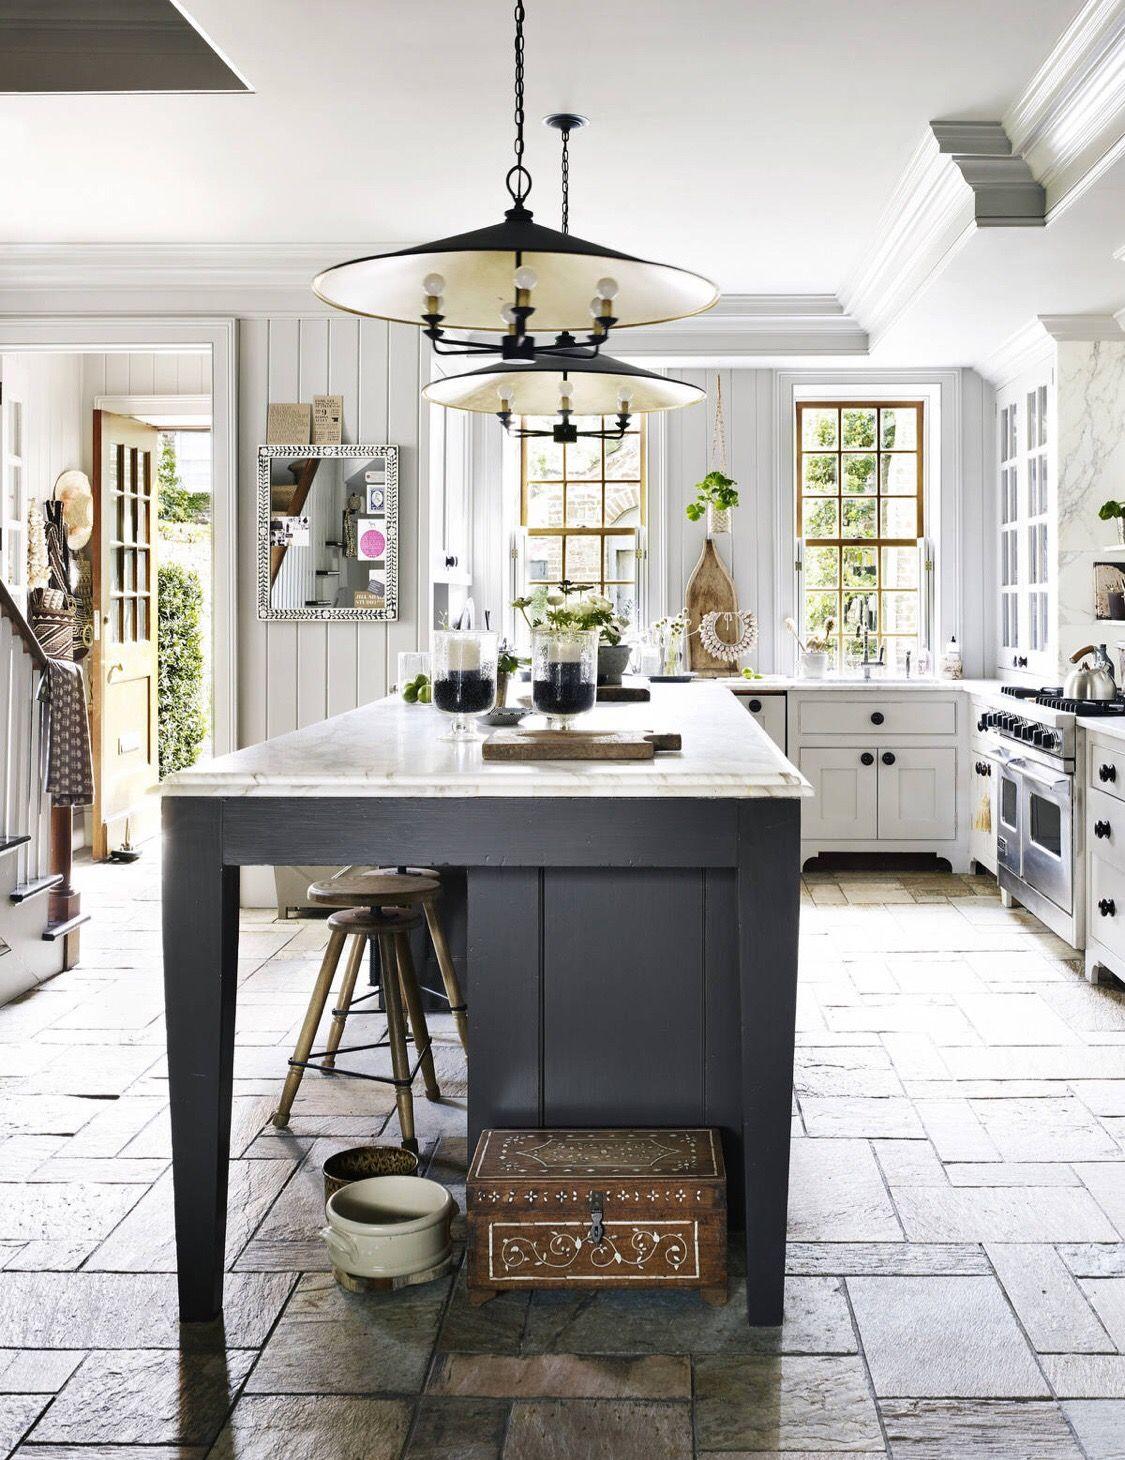 TRIBAL CHIC CHARLESTON HOME | Interior design advice, Bungalow and ...